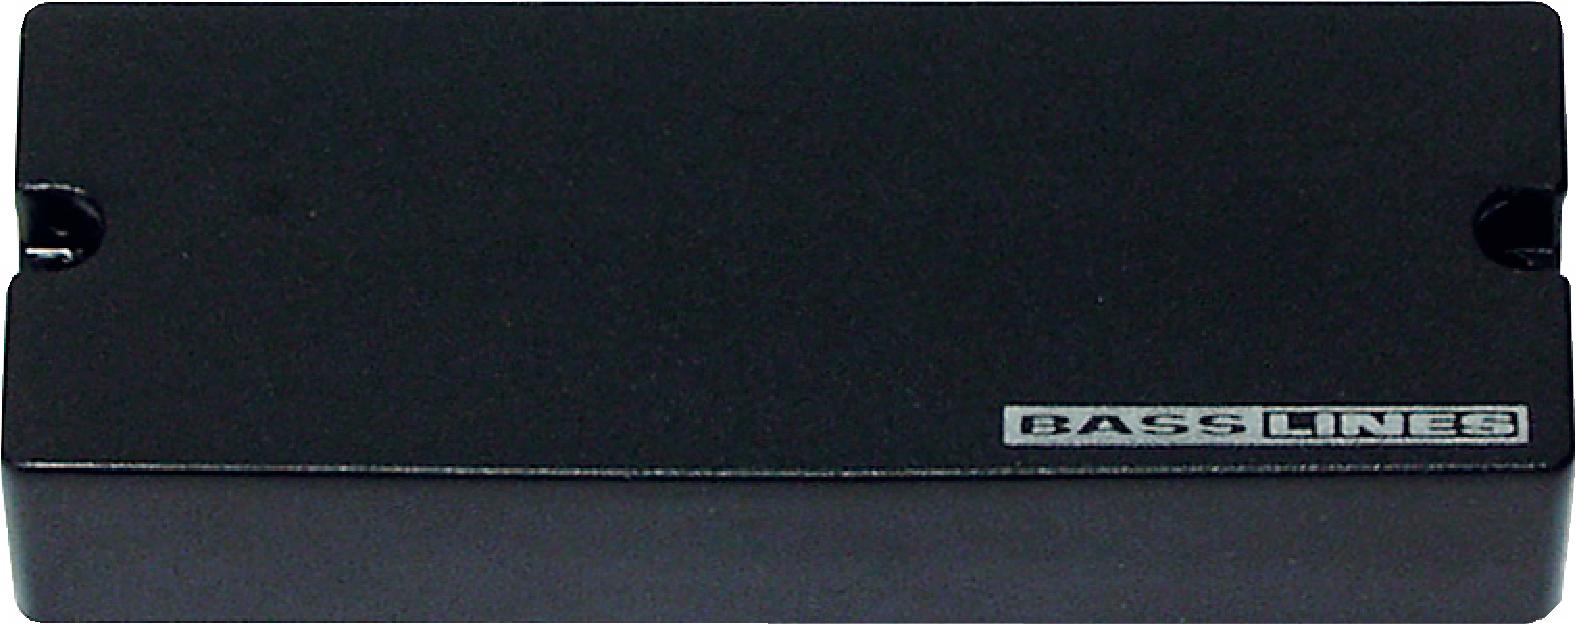 Seymour Duncan ASB2-5N